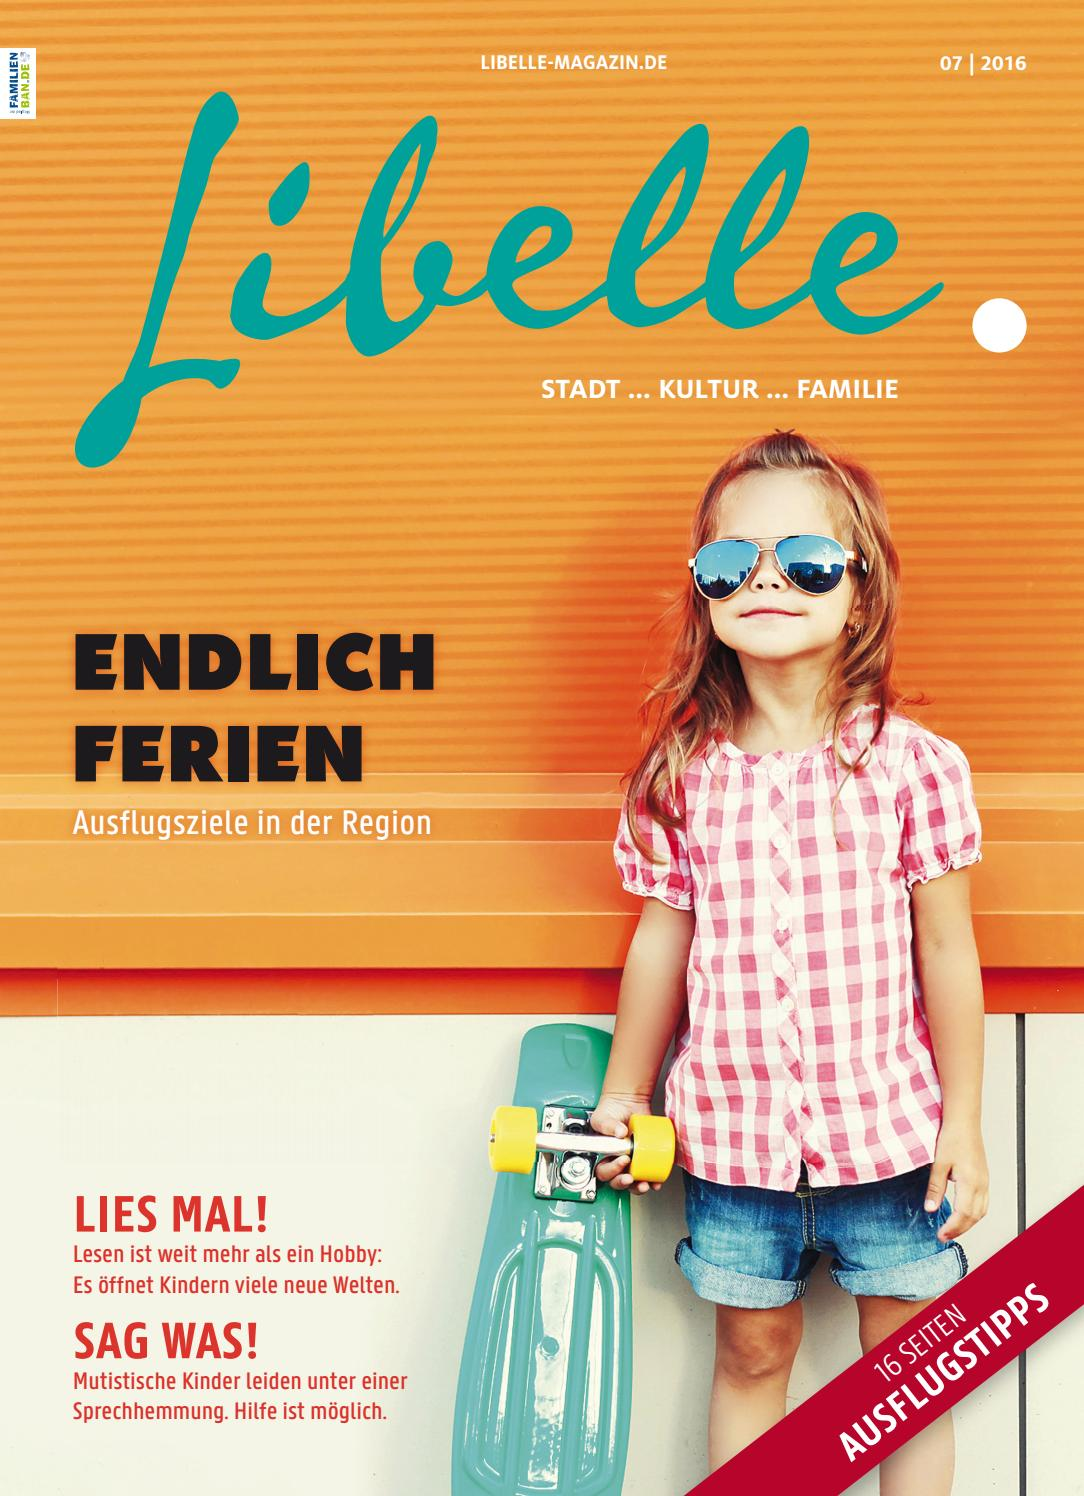 Libelle Juli 2016 by Libelle   Stadt ... Kultur ... Familie - issuu